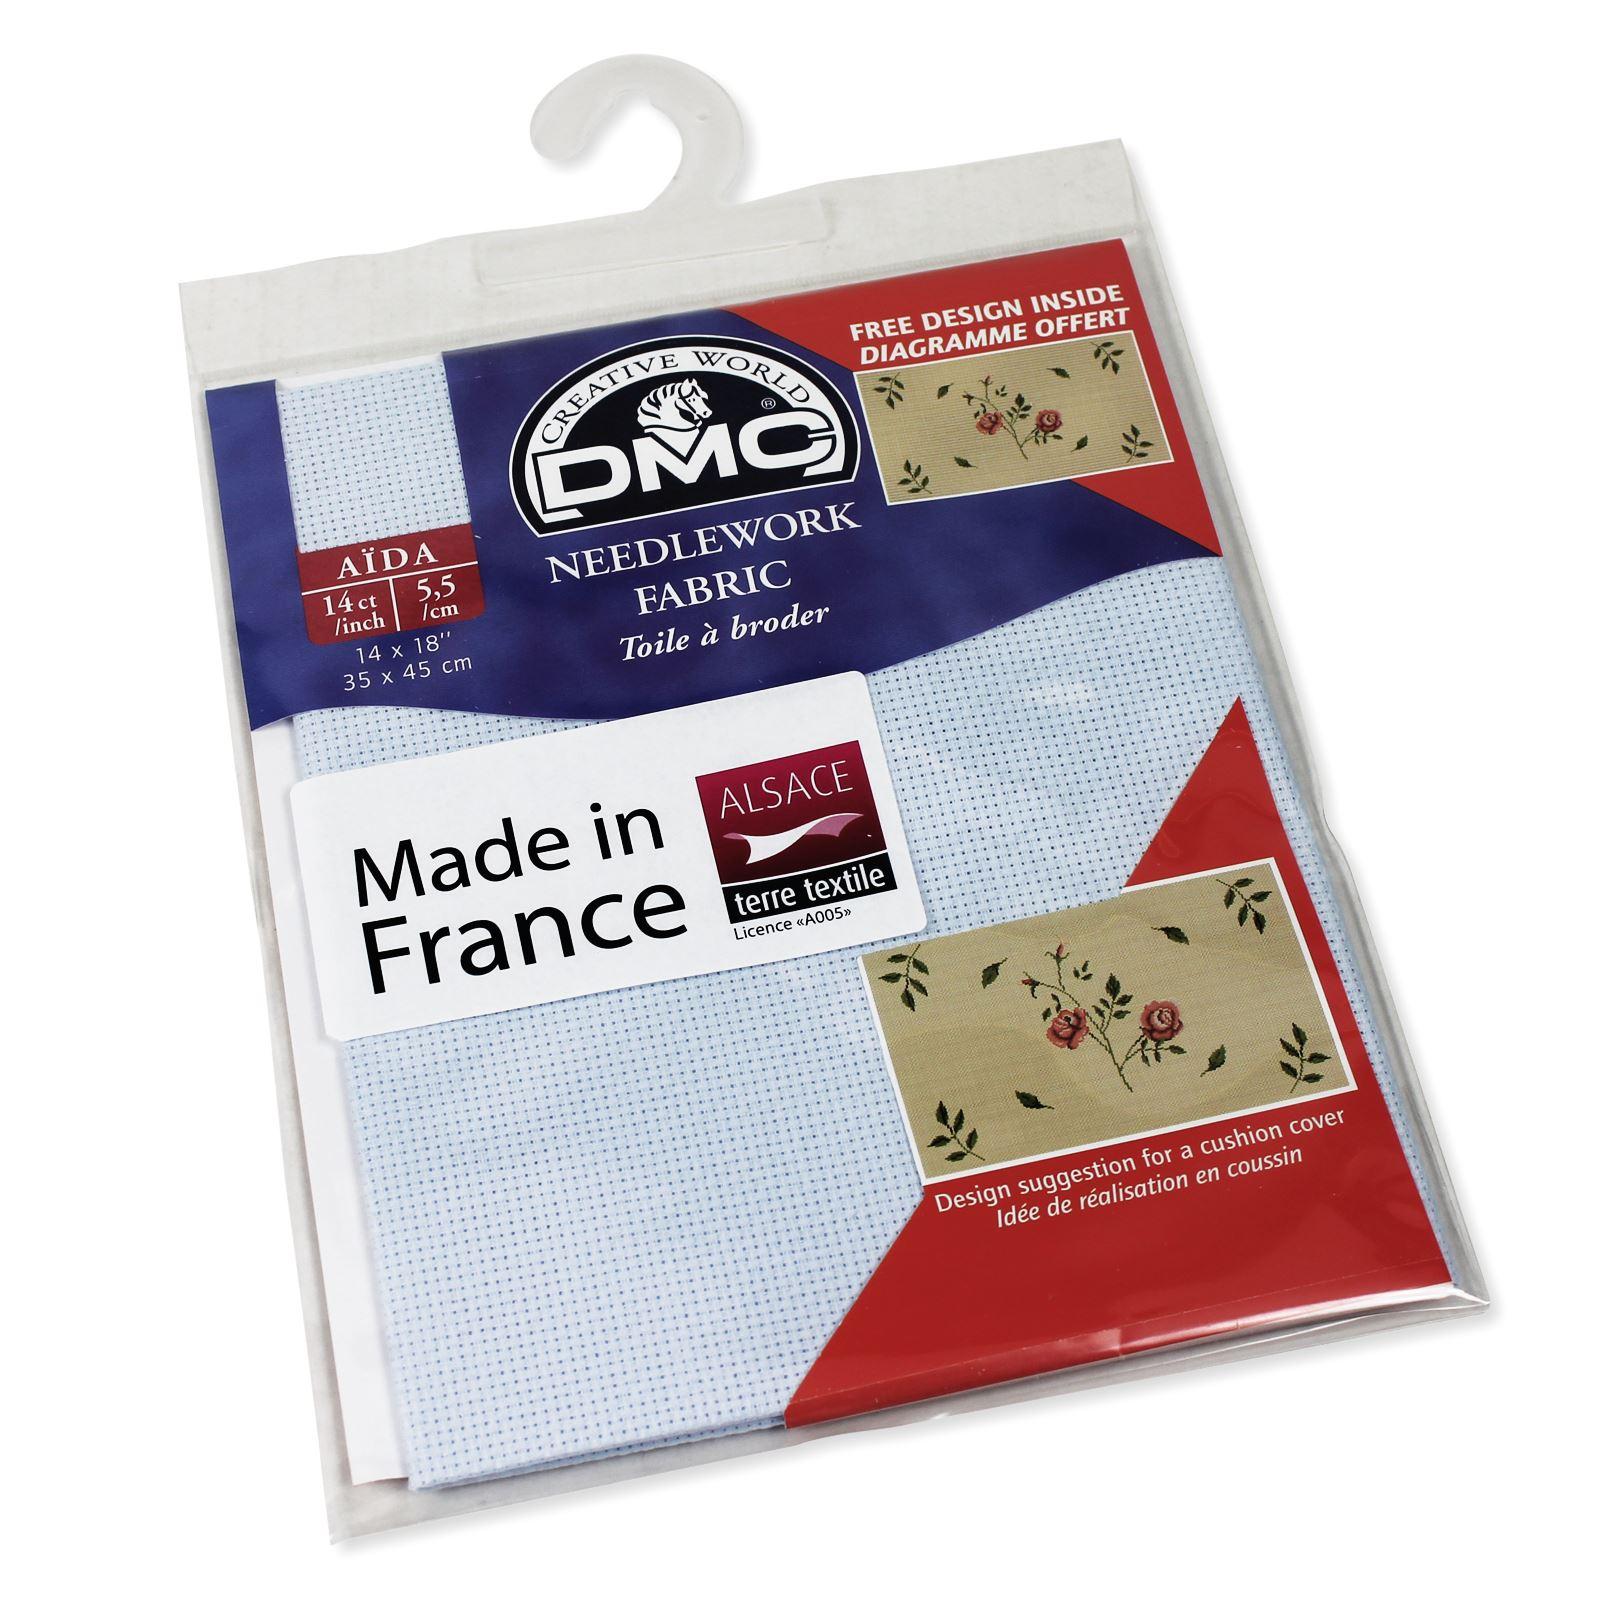 Dmc Aida Needlework Fabric Cross Stitch Canvas Material Ebay